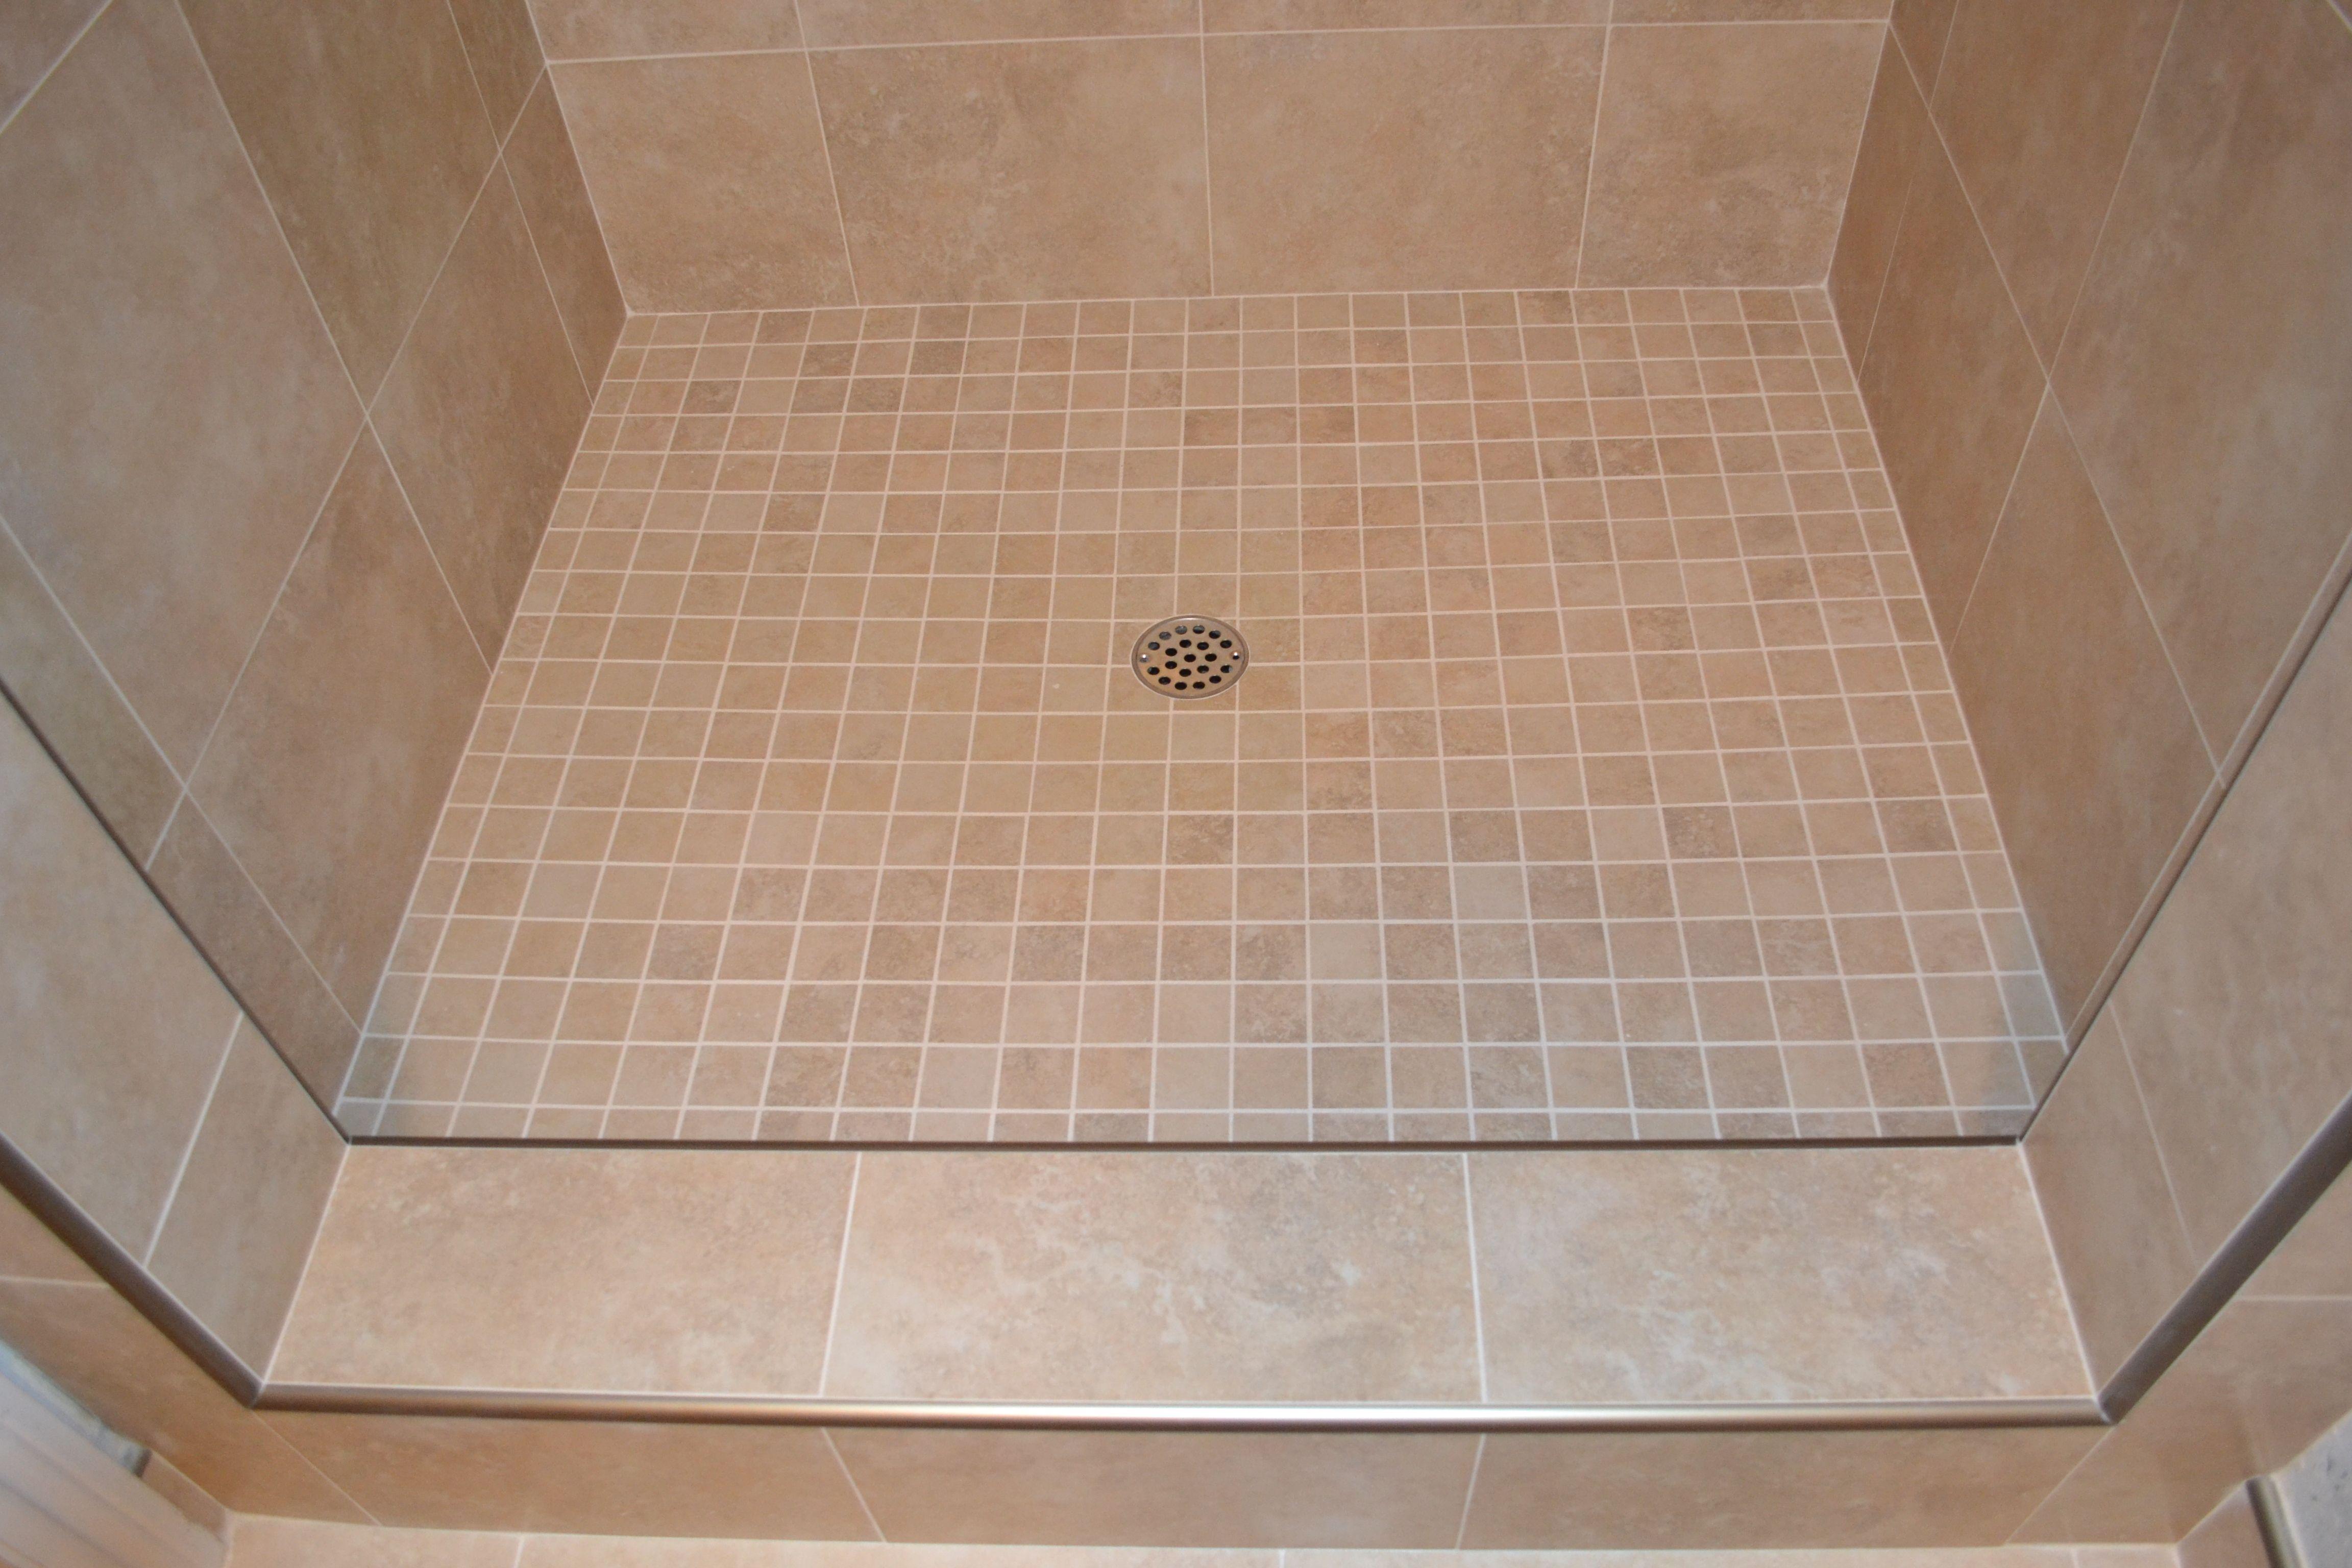 Tiled shower floor area. Schulter edge trim / Marcus Marty